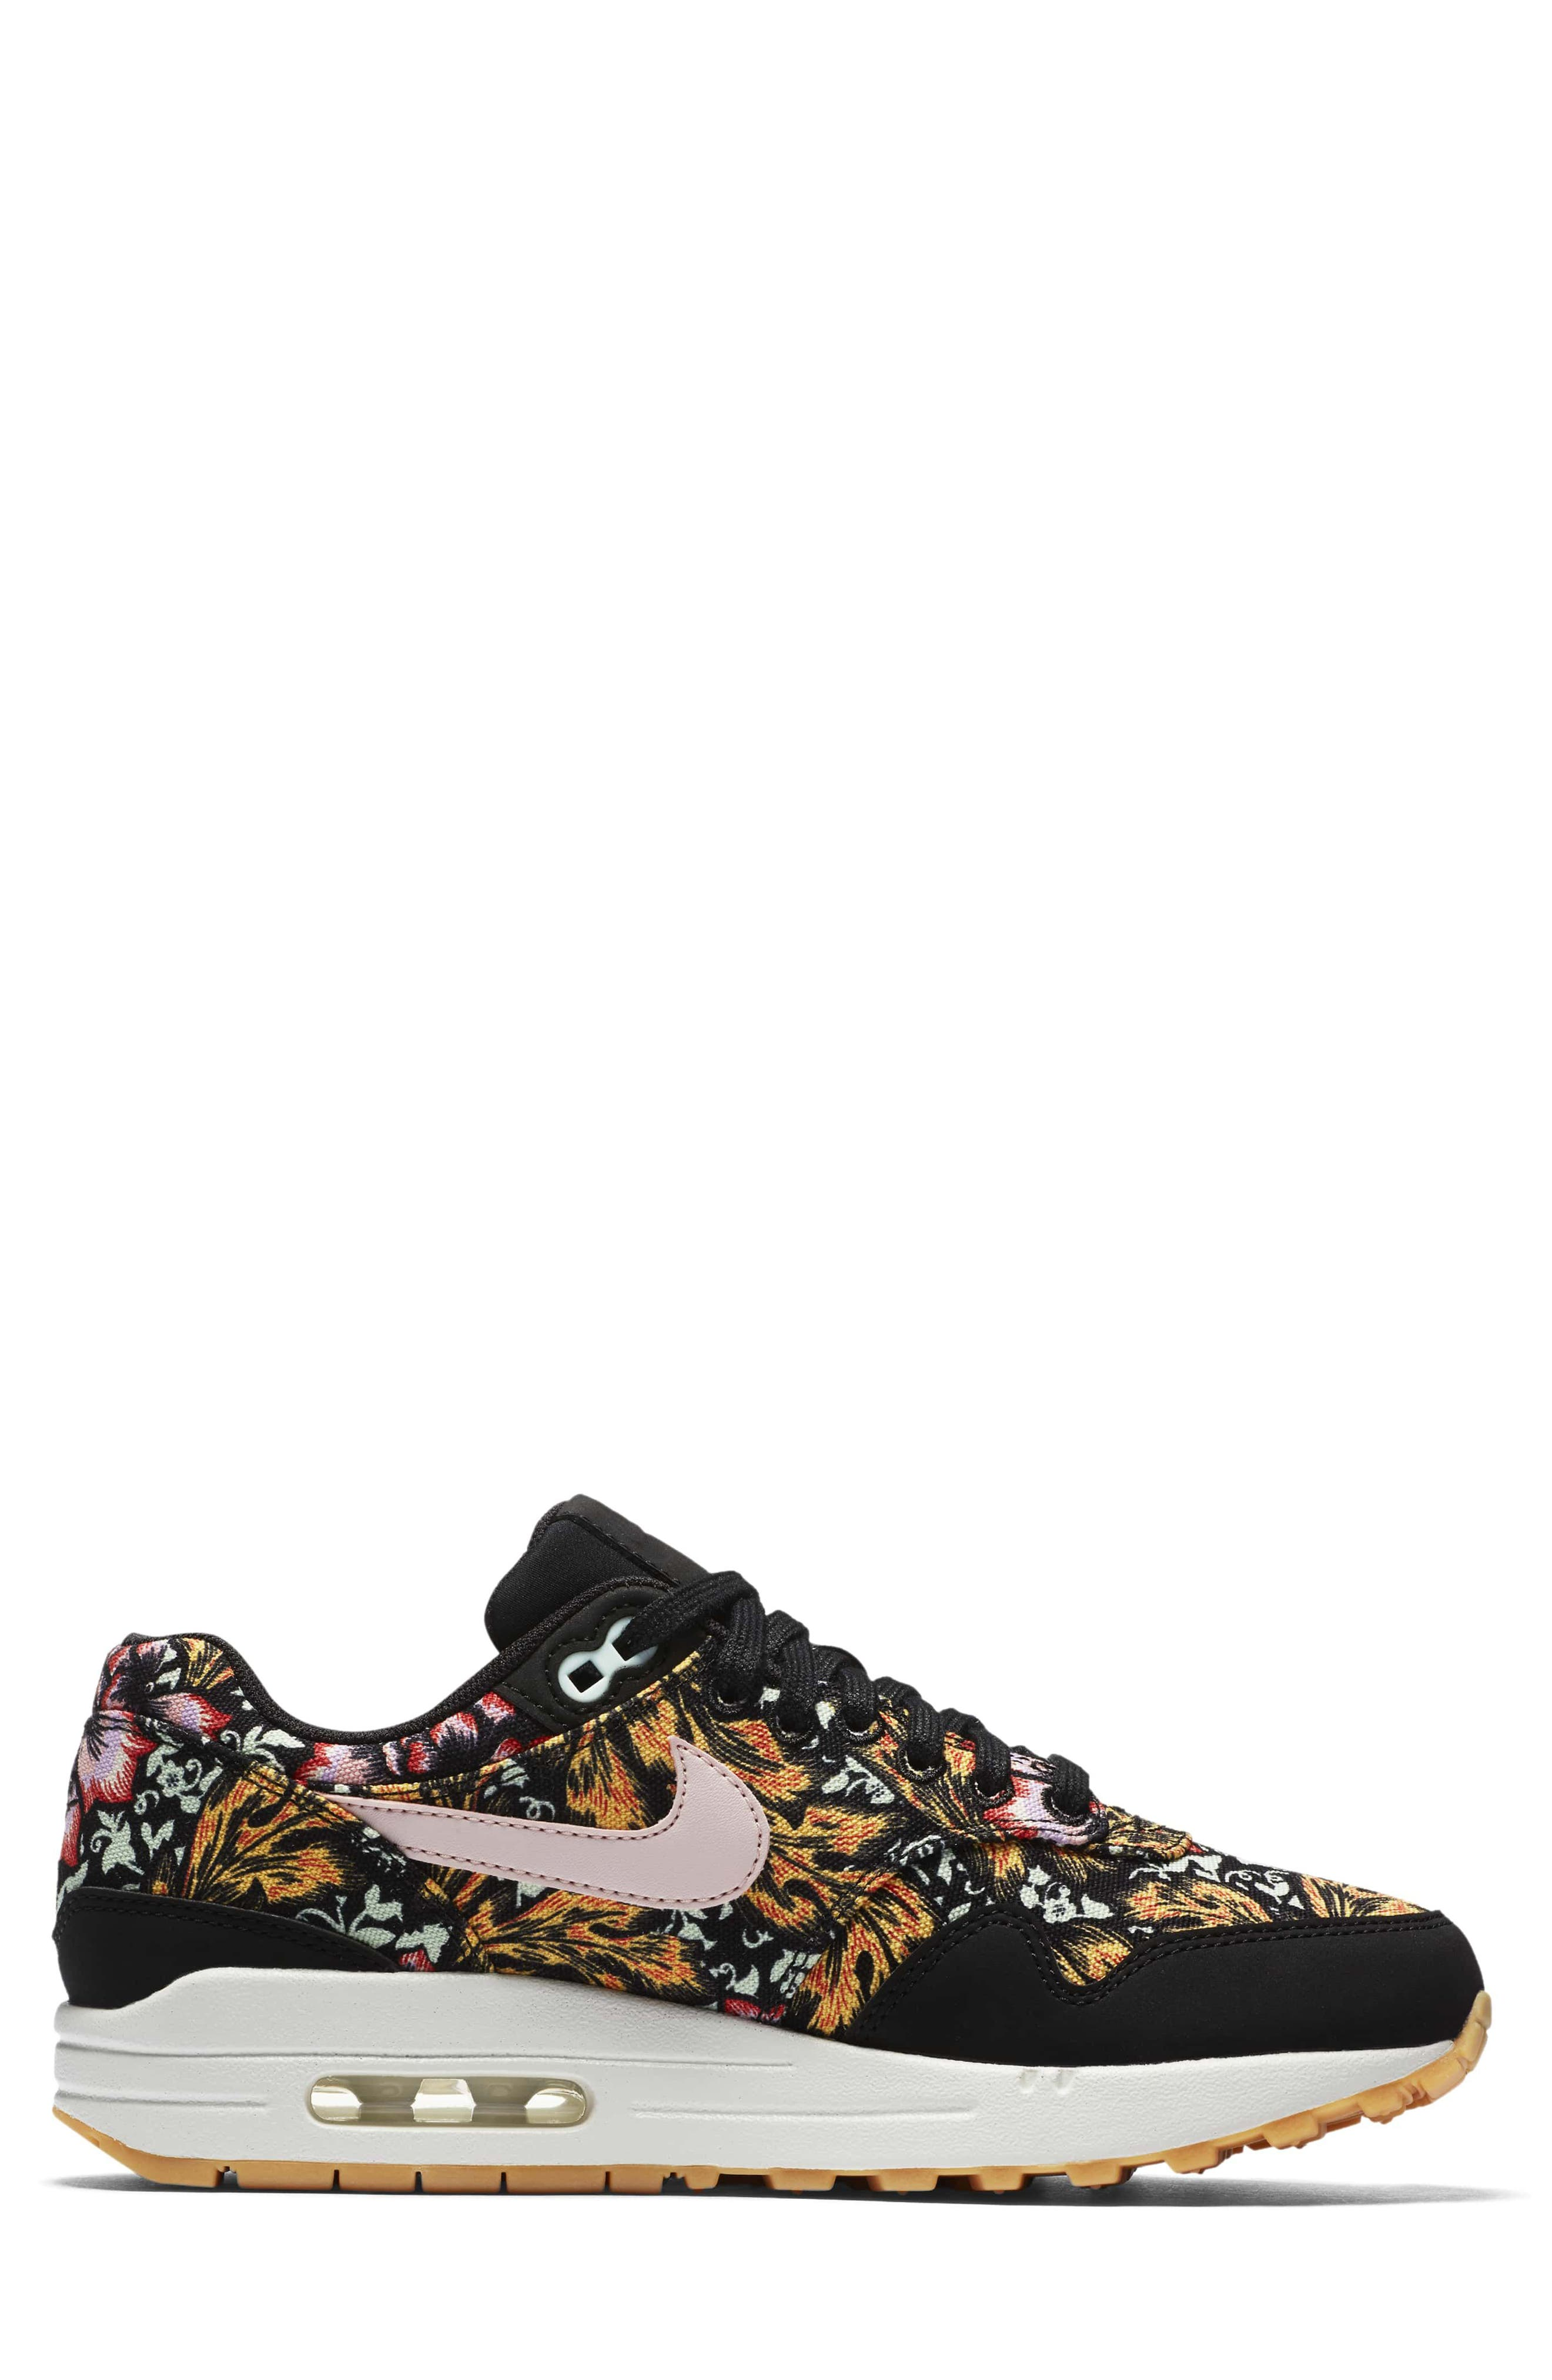 Air Max 1 QS Sneaker,                             Alternate thumbnail 3, color,                             003